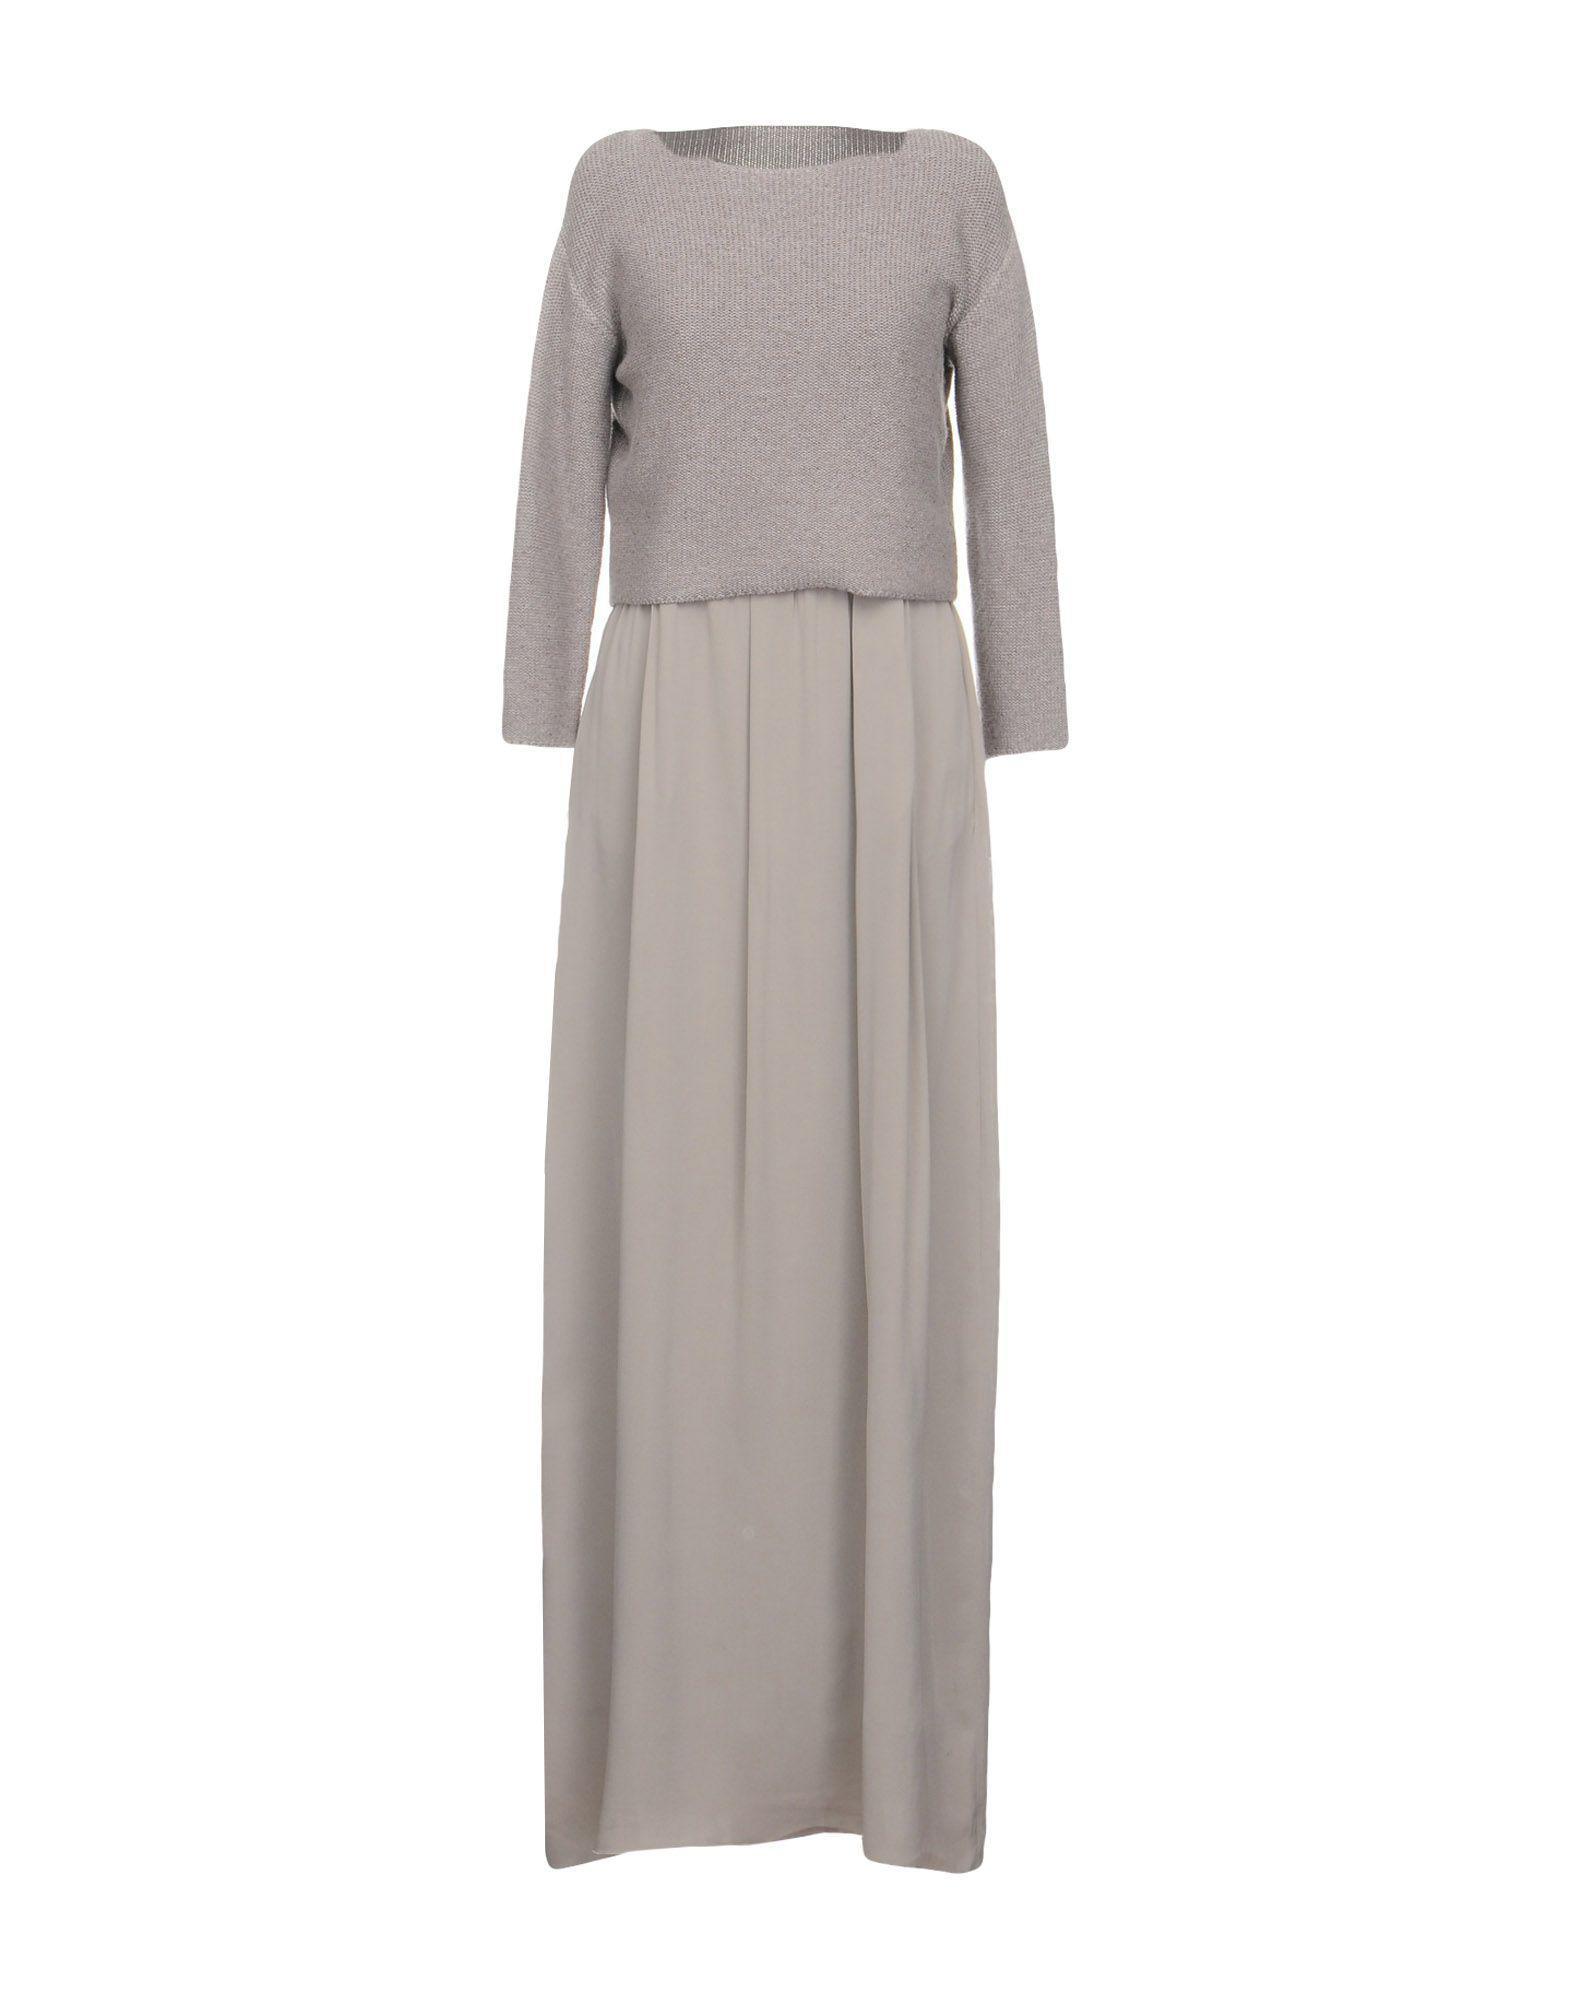 Gray Dress Lyst Filippi In Long Fabiana BwS7qpSxHF